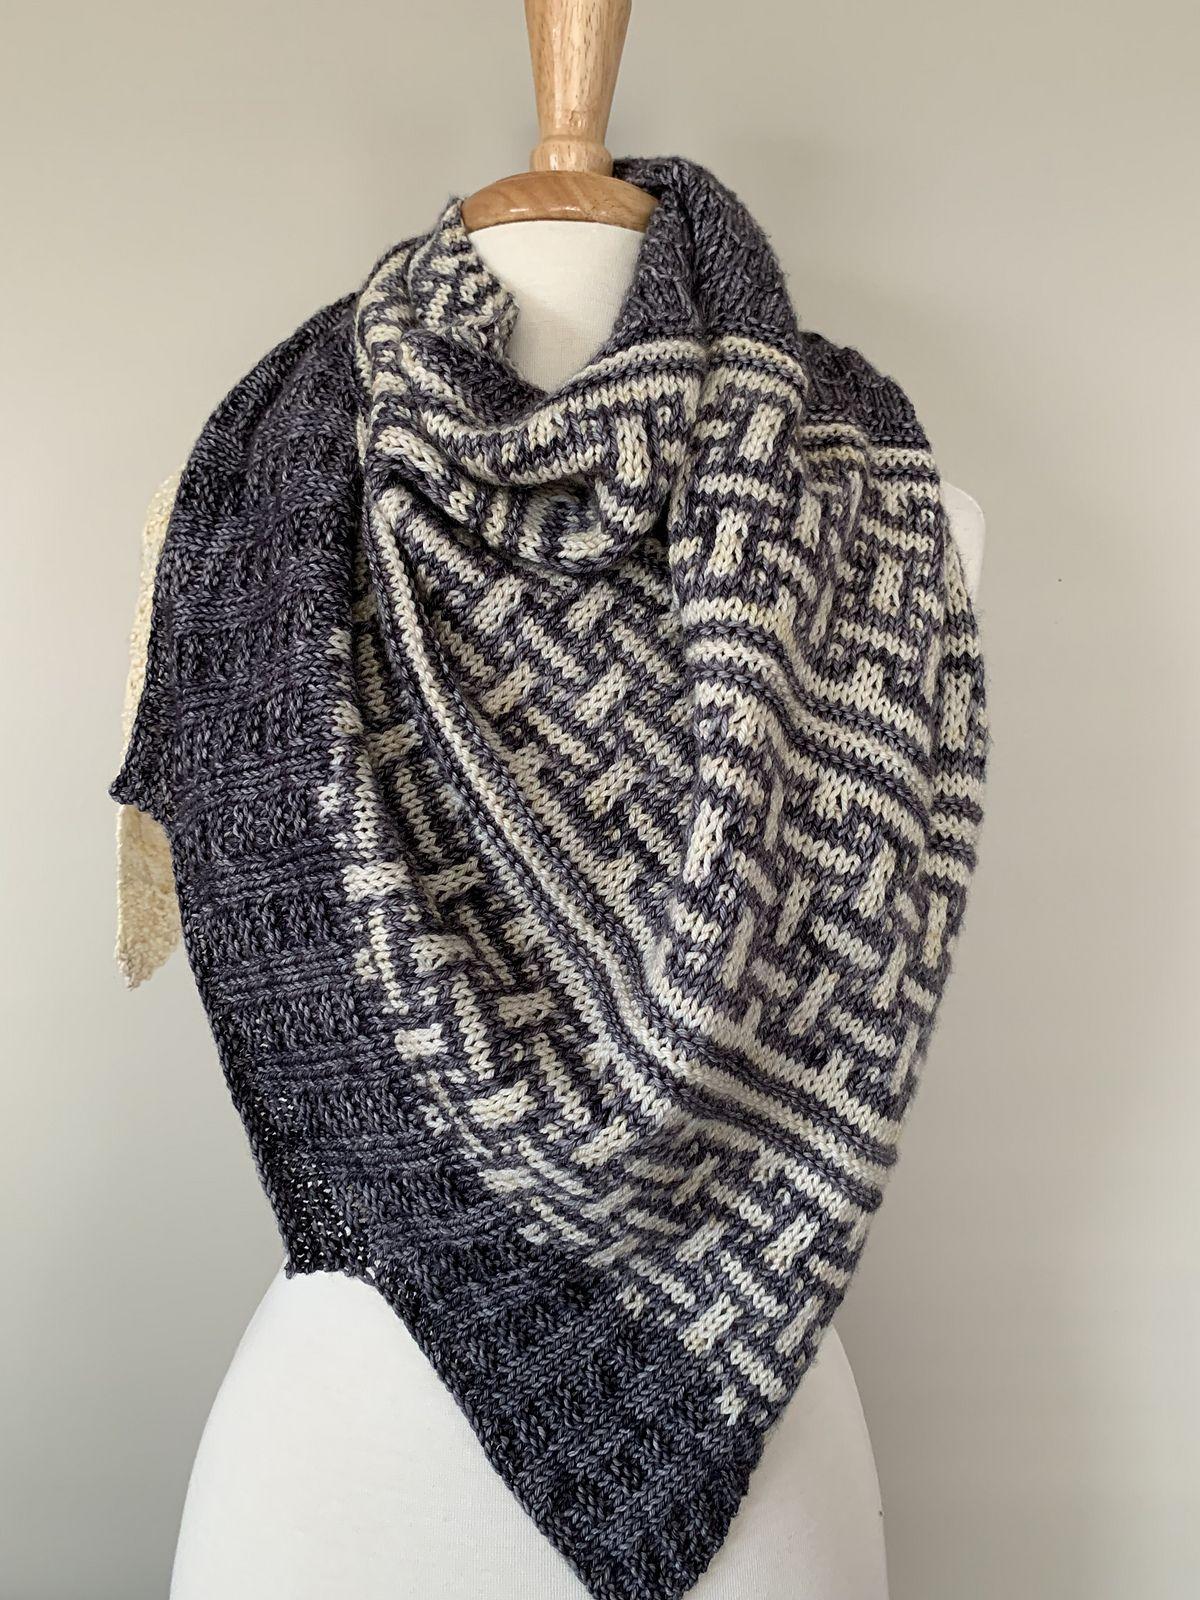 Snowcastles   Loom knitting patterns, Sweater pattern, Pattern